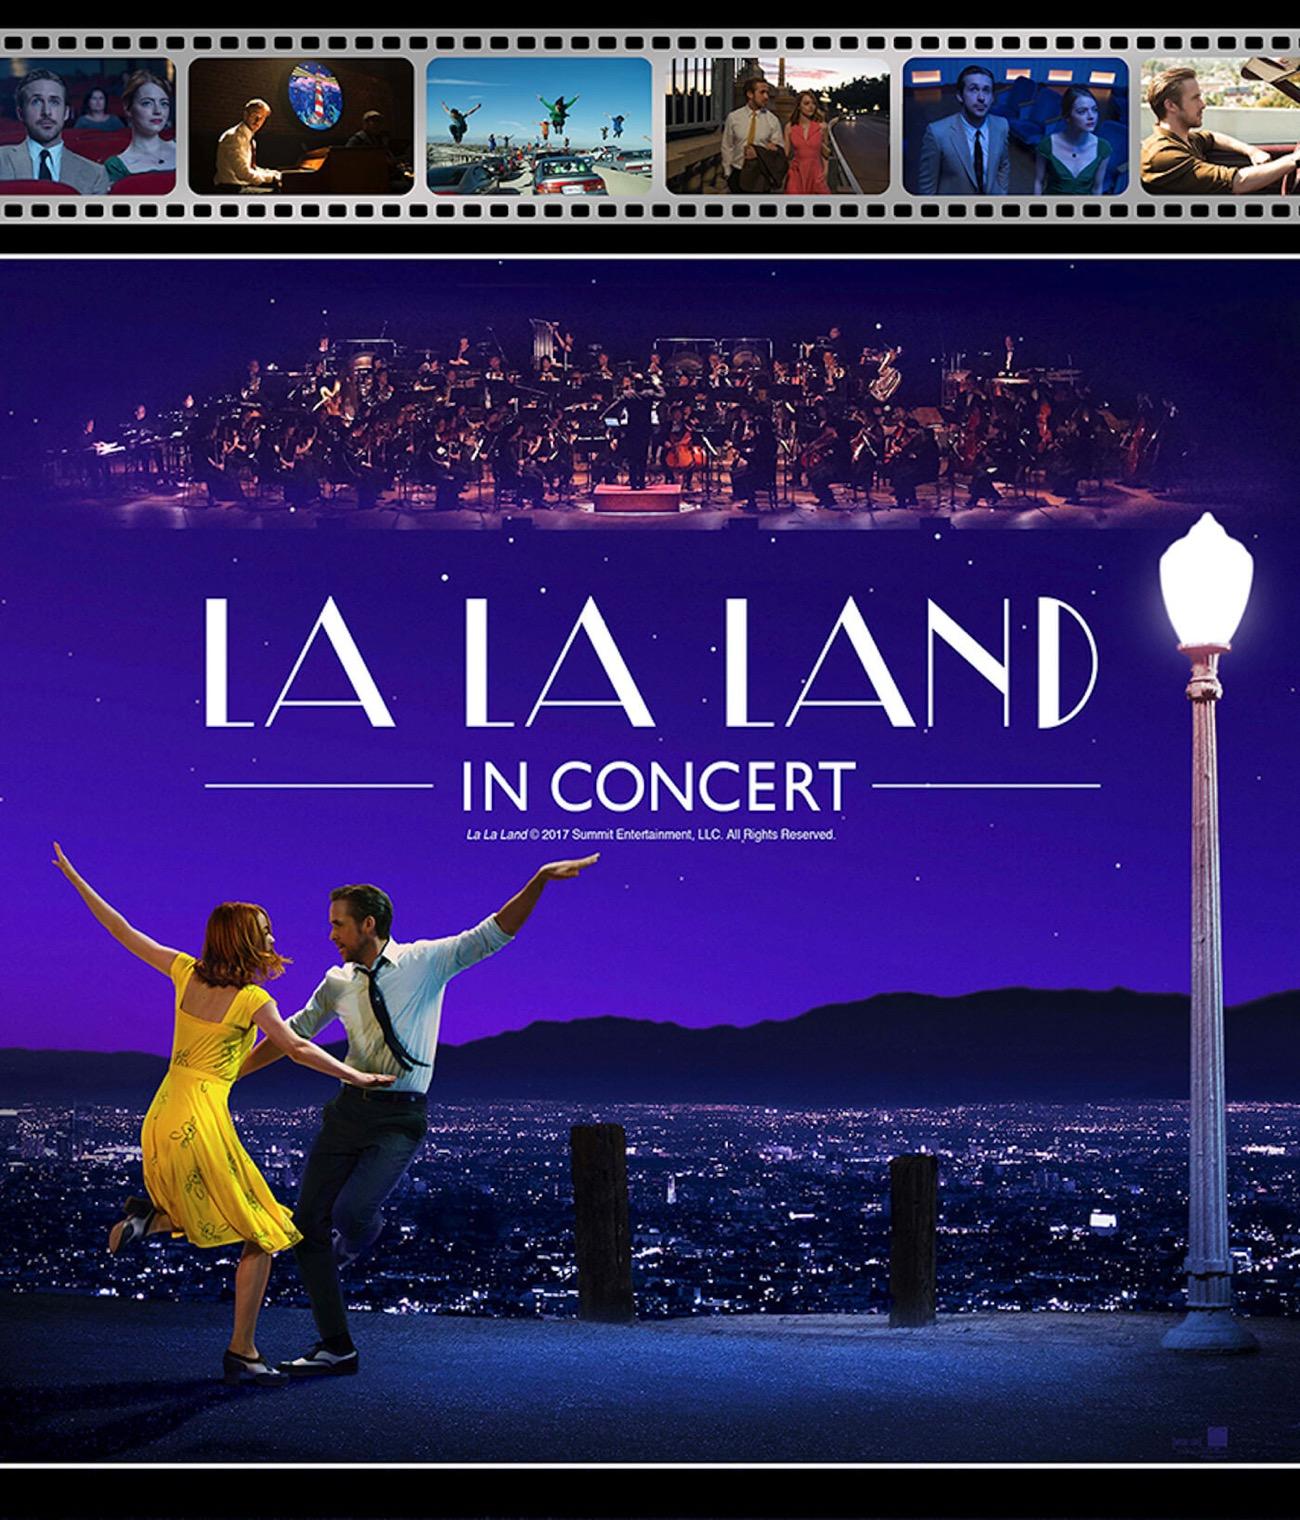 Lala concert A 2 170406 s